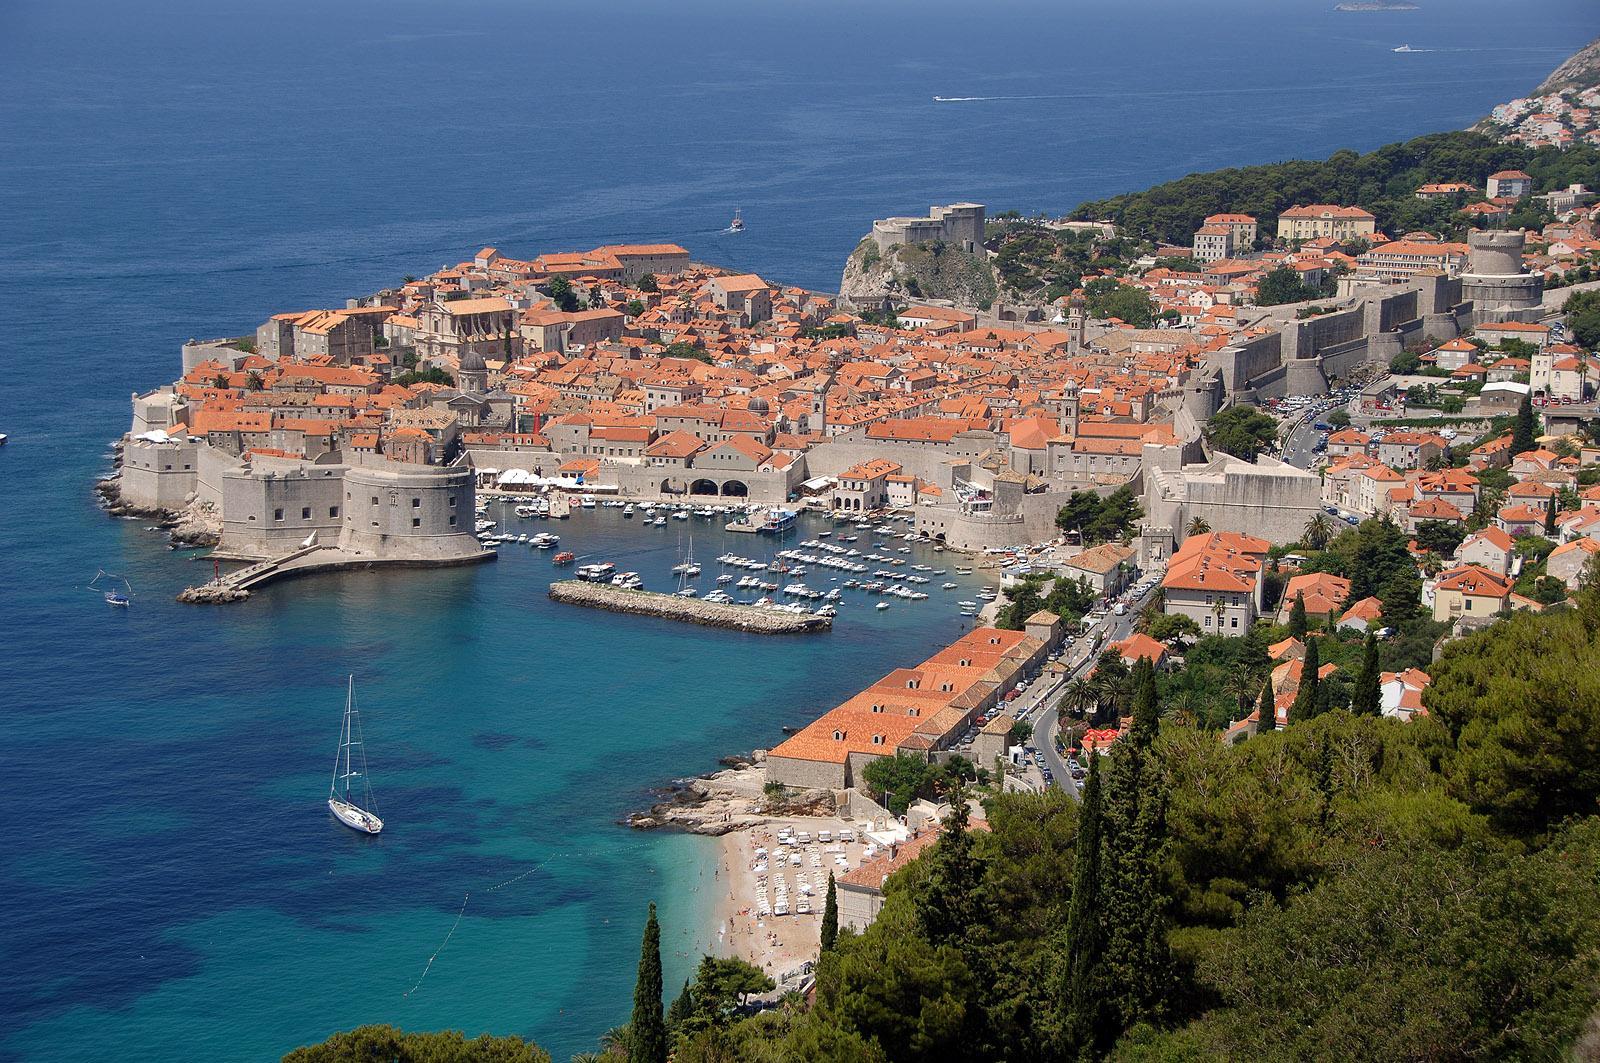 TZ grada Dubrovnik